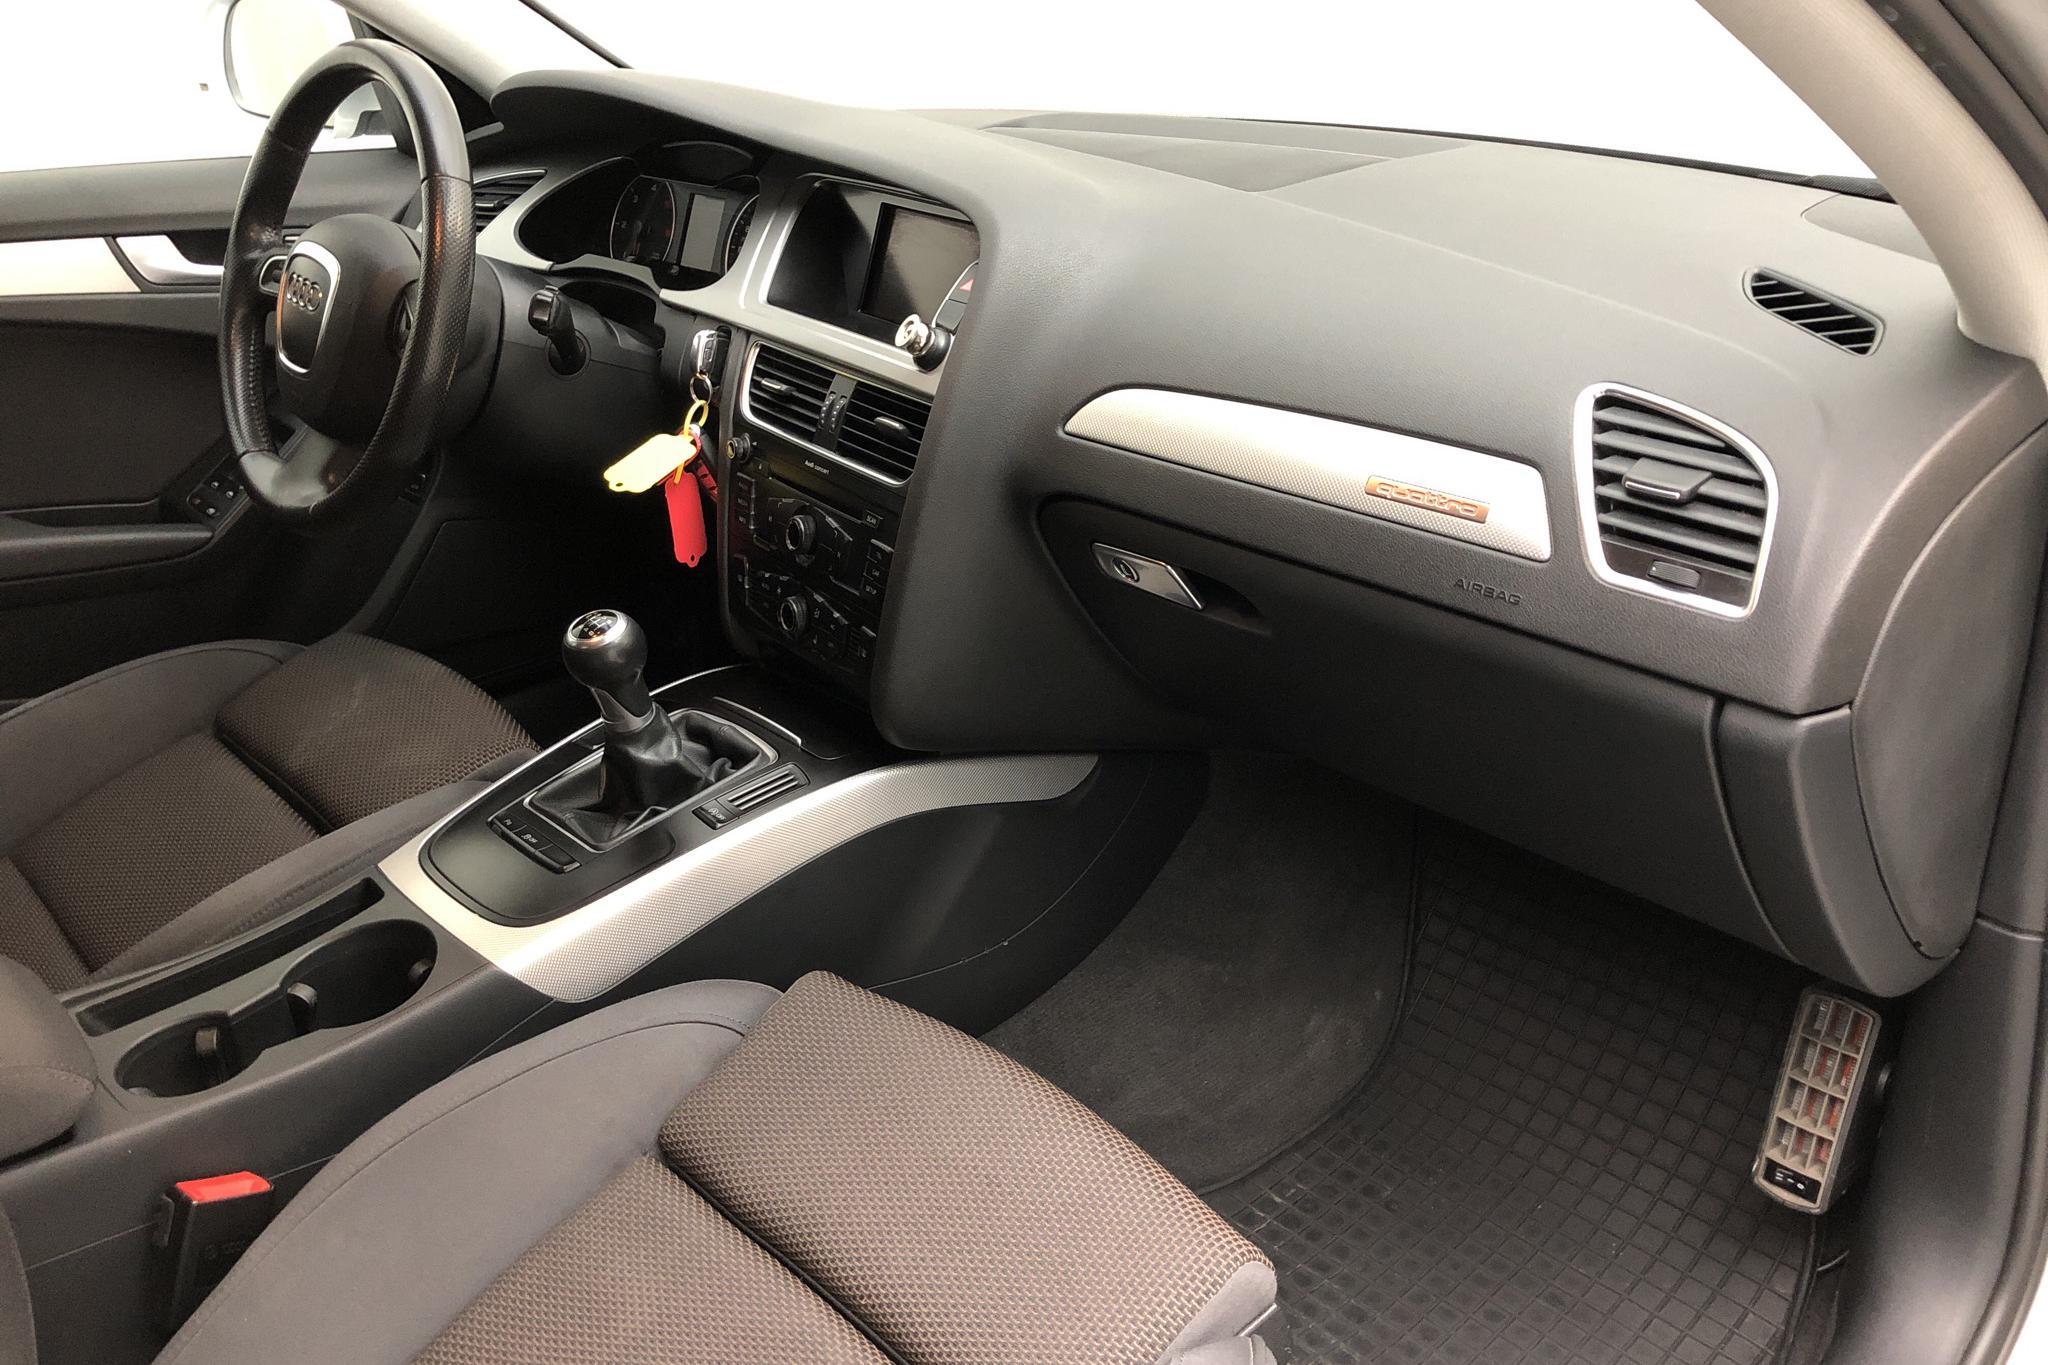 Audi A4 Allroad 2.0 TDI Avant quattro (170hk) - 221 530 km - Manual - silver - 2011